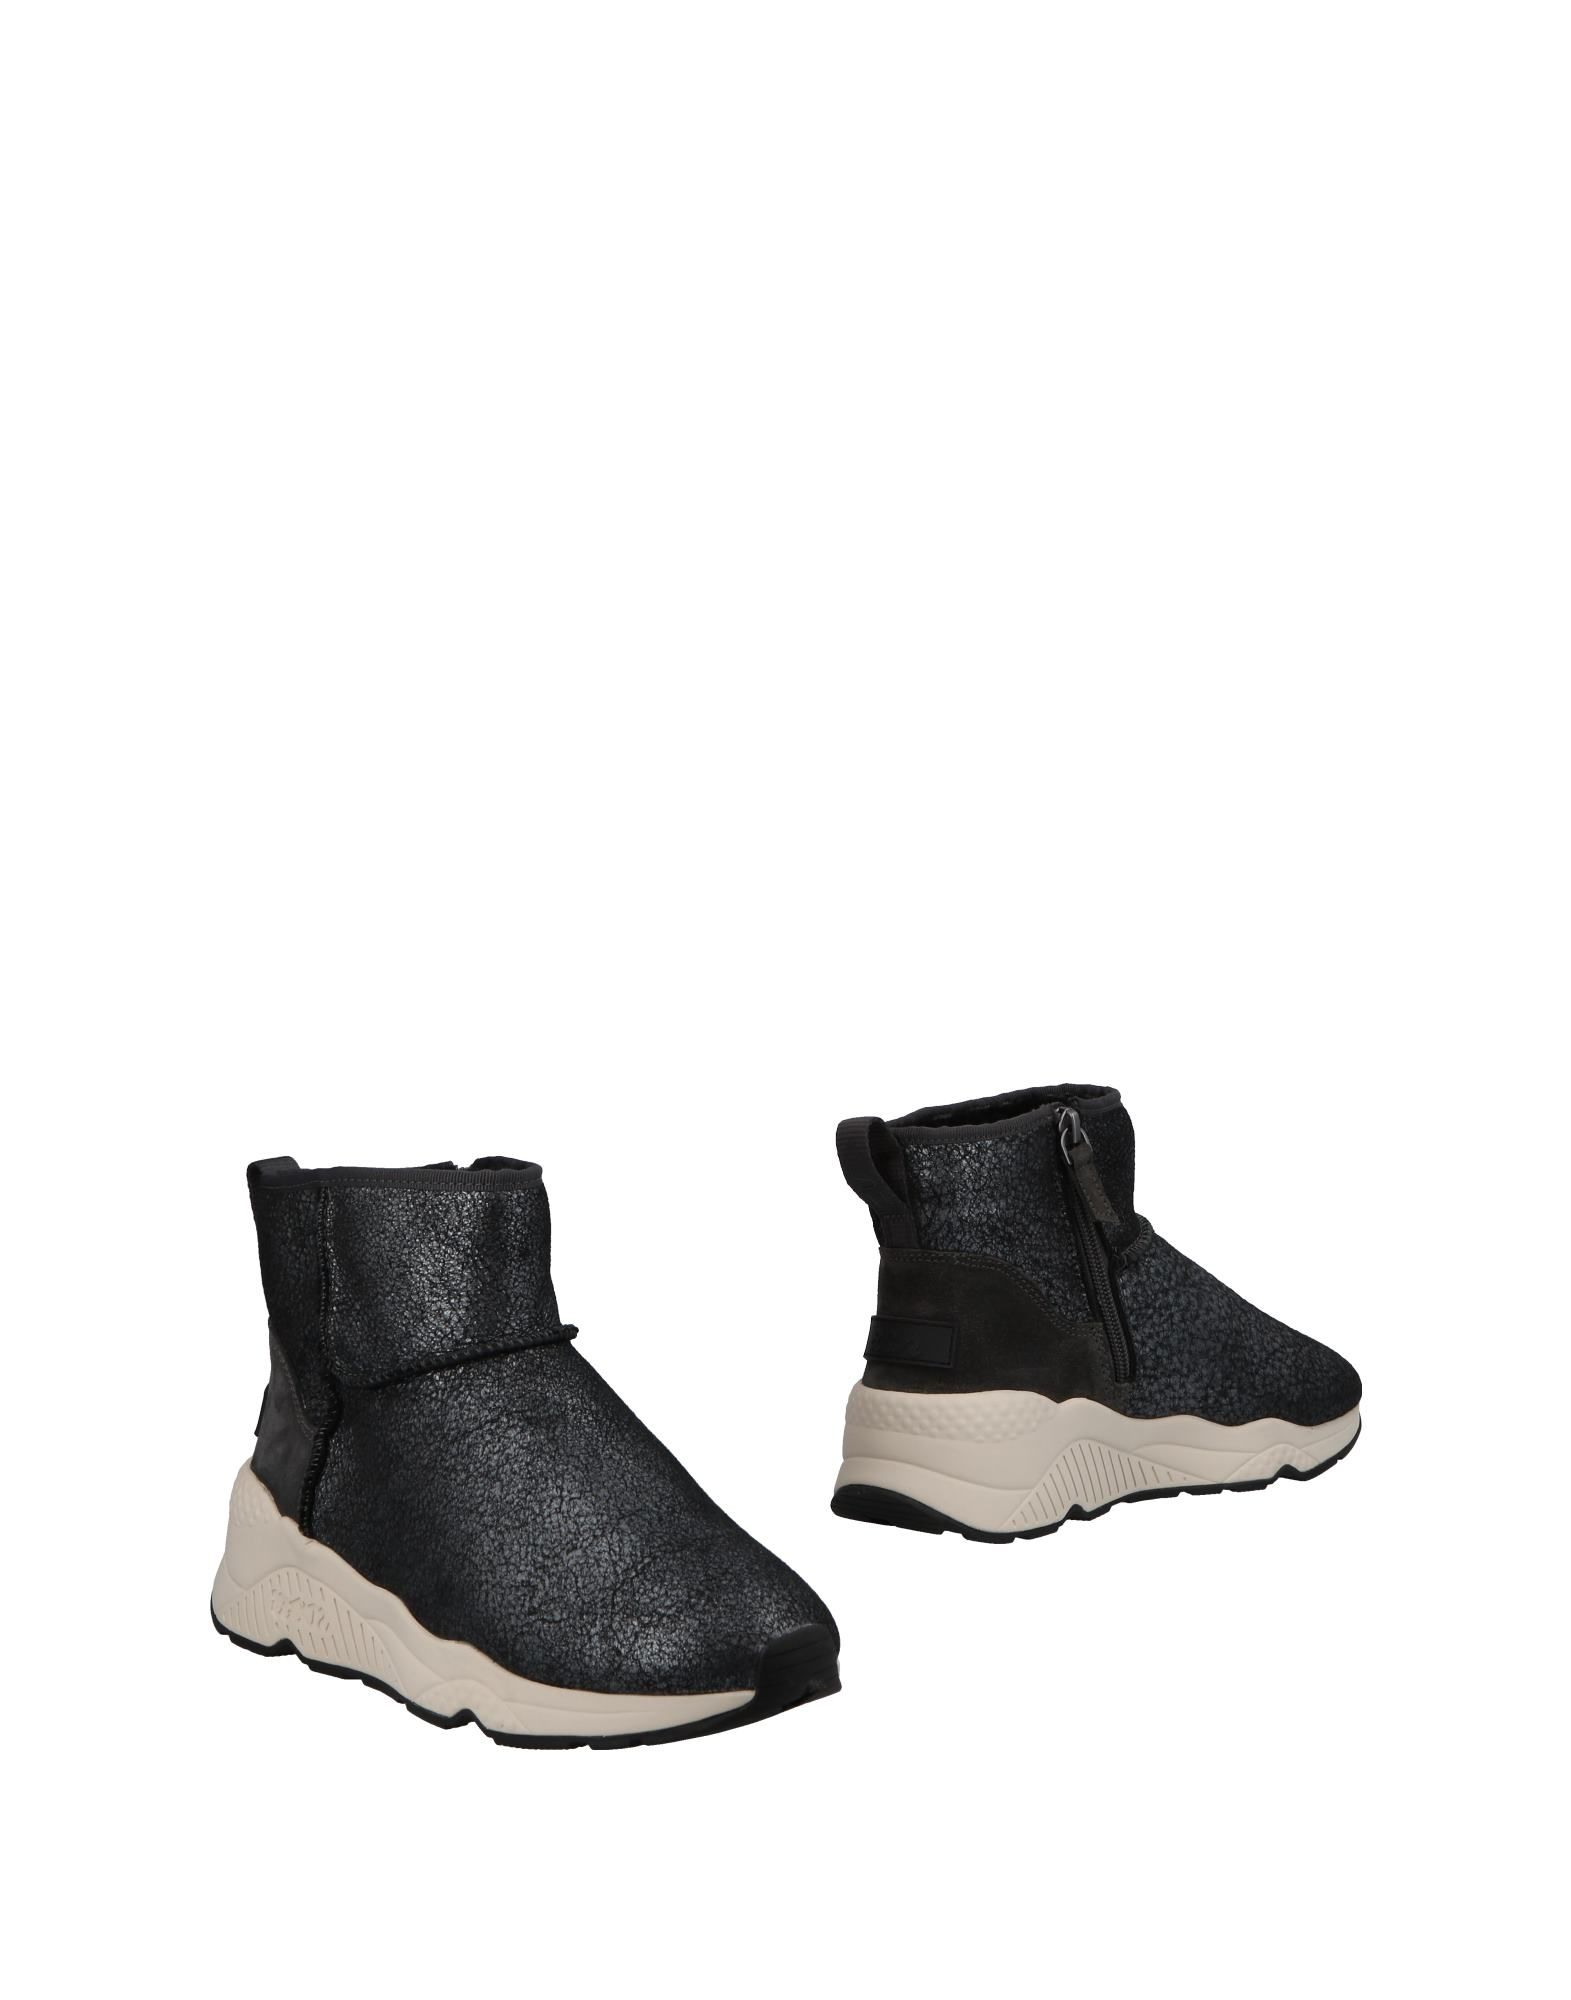 Stilvolle billige Schuhe Damen Ash Stiefelette Damen Schuhe  11226474EJ cd6a87